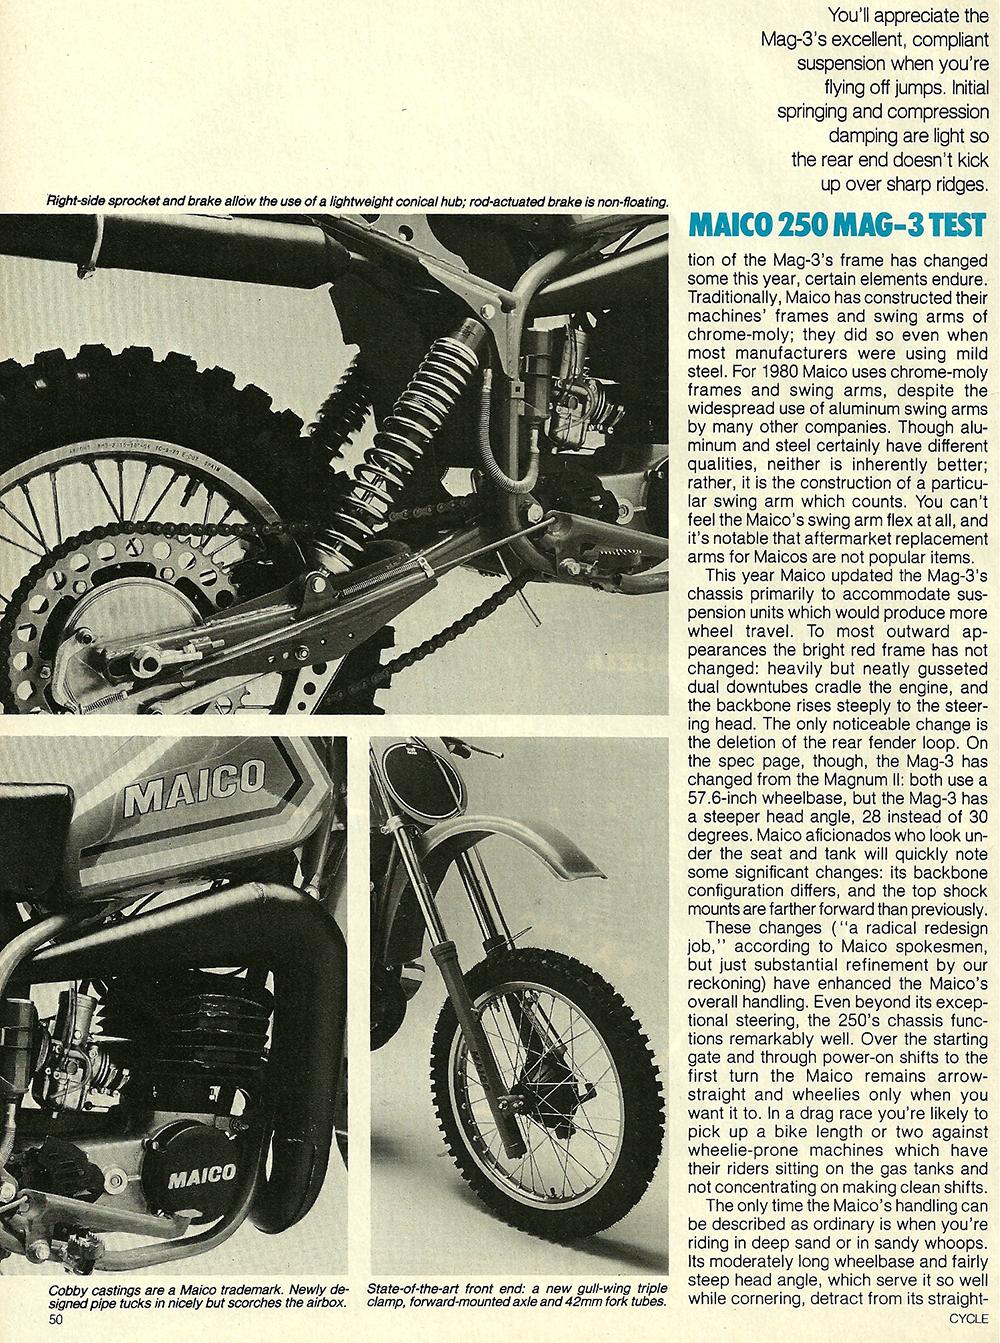 1980 Maico 250 Mag-3 road test 3.jpg